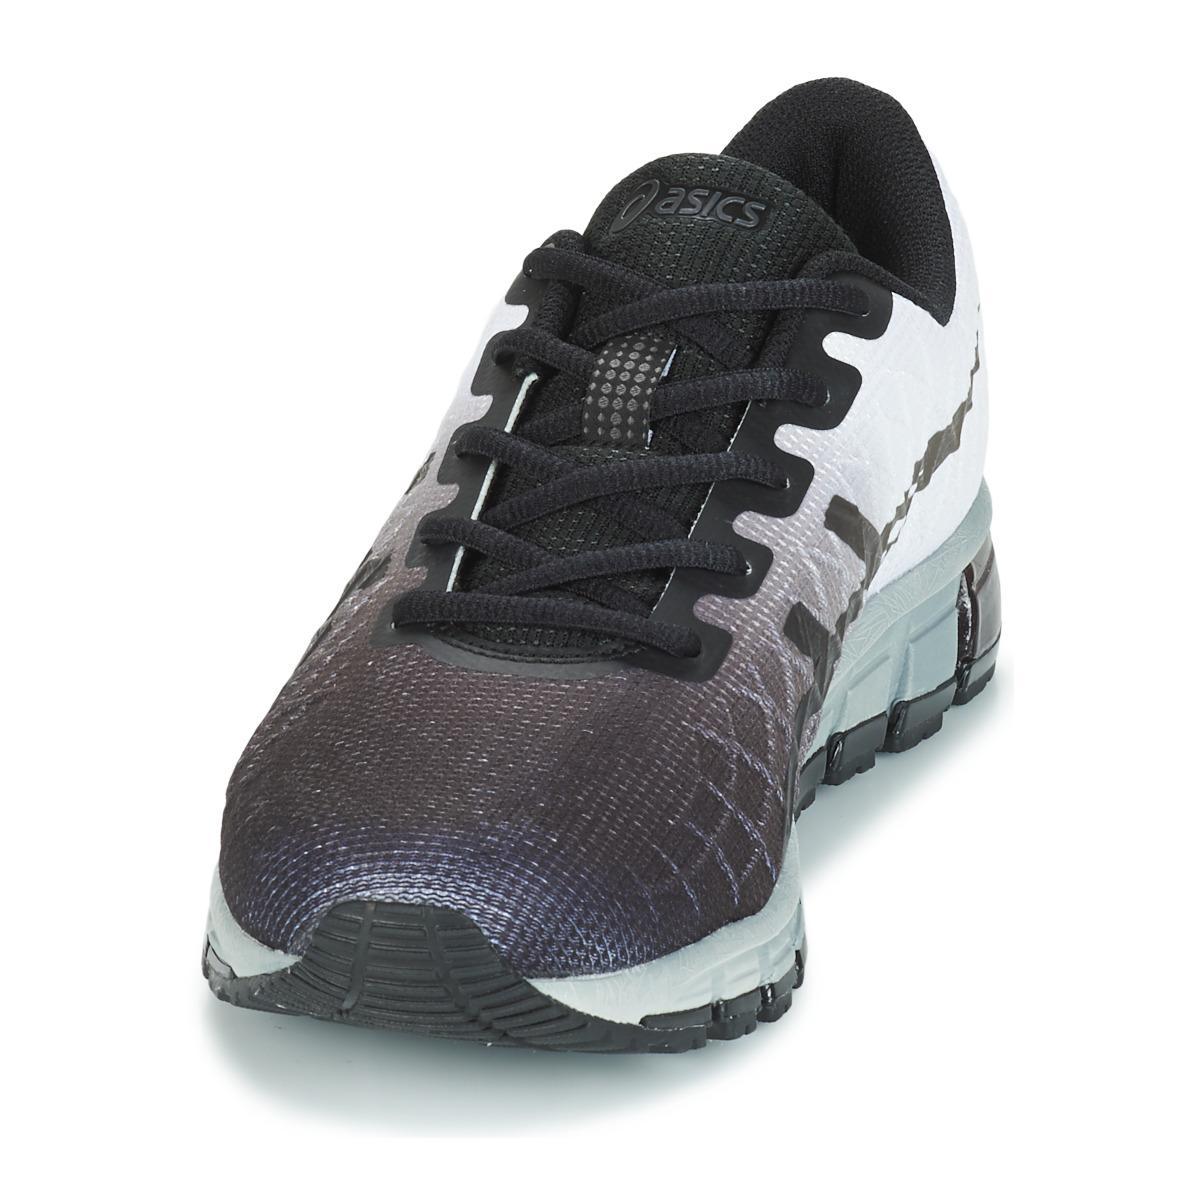 huge selection of a54ed 4e707 Asics - Black Gel-quantum 180 4 Shoes (trainers) for Men - Lyst. View  fullscreen